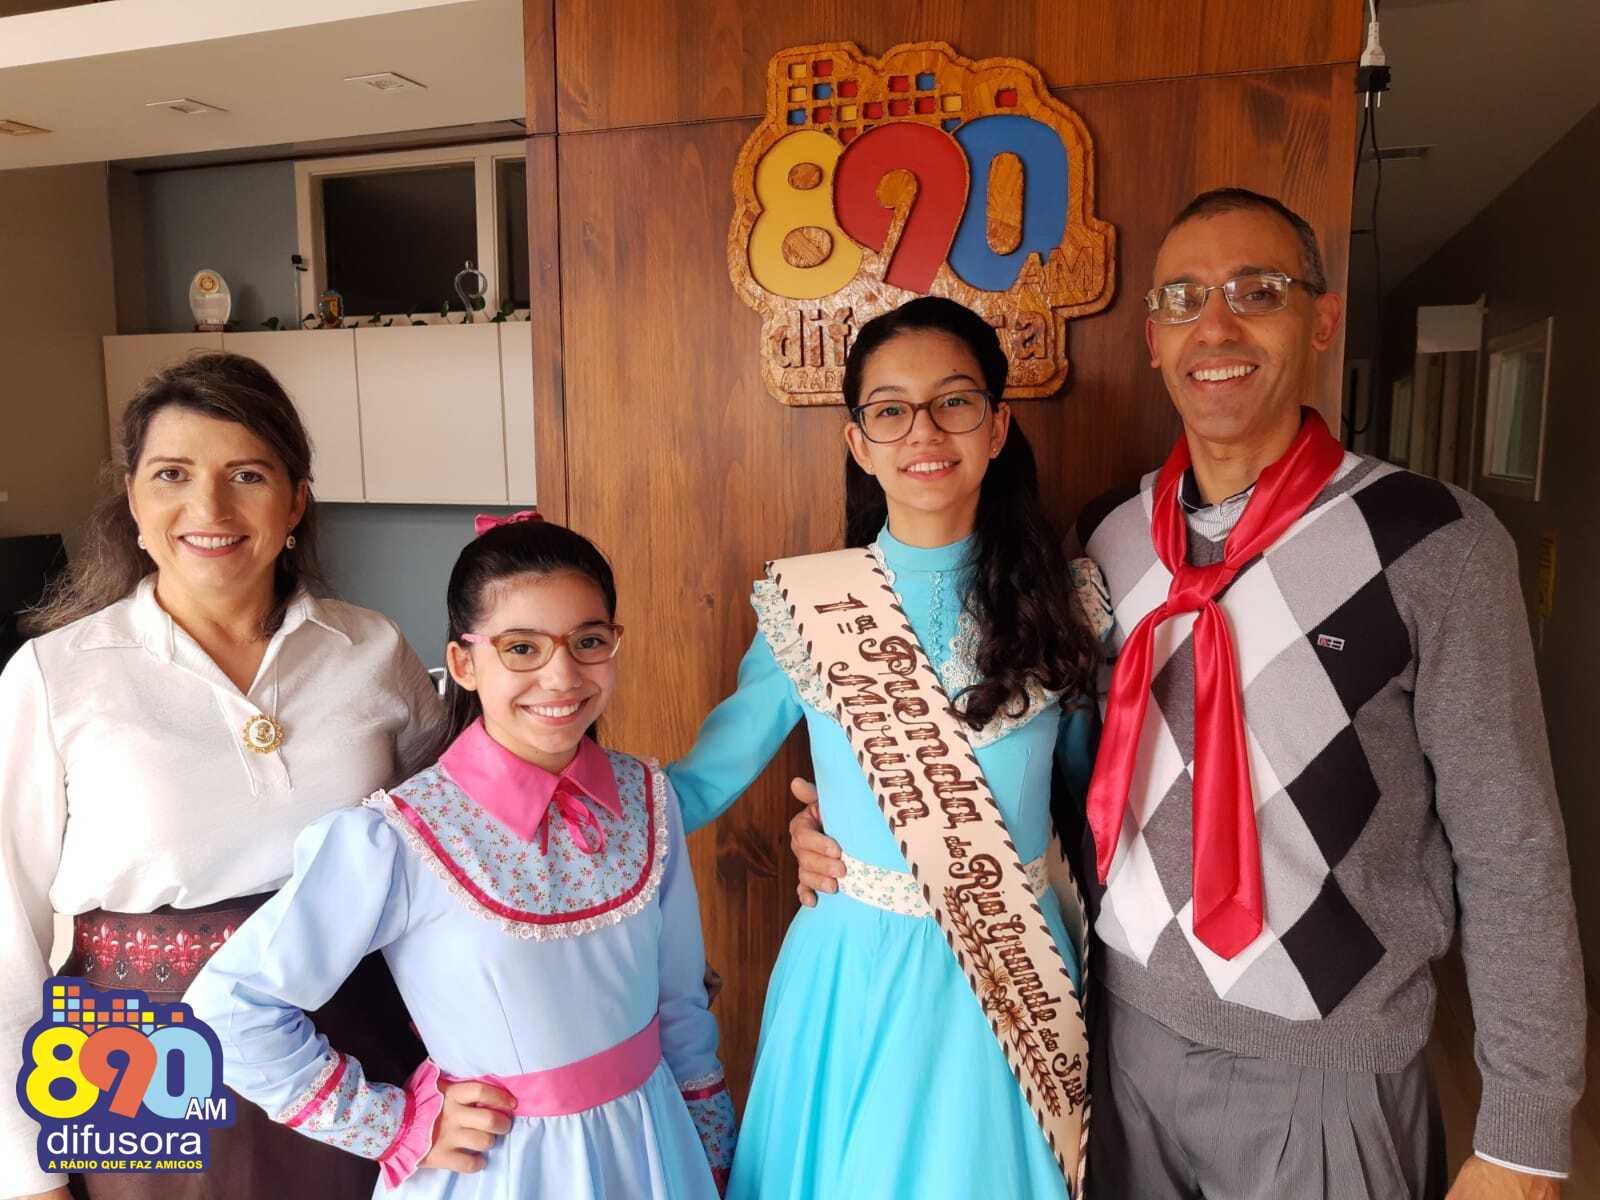 Rádio Difusora recebe a Prenda Mirim do Rio Grande do Sul